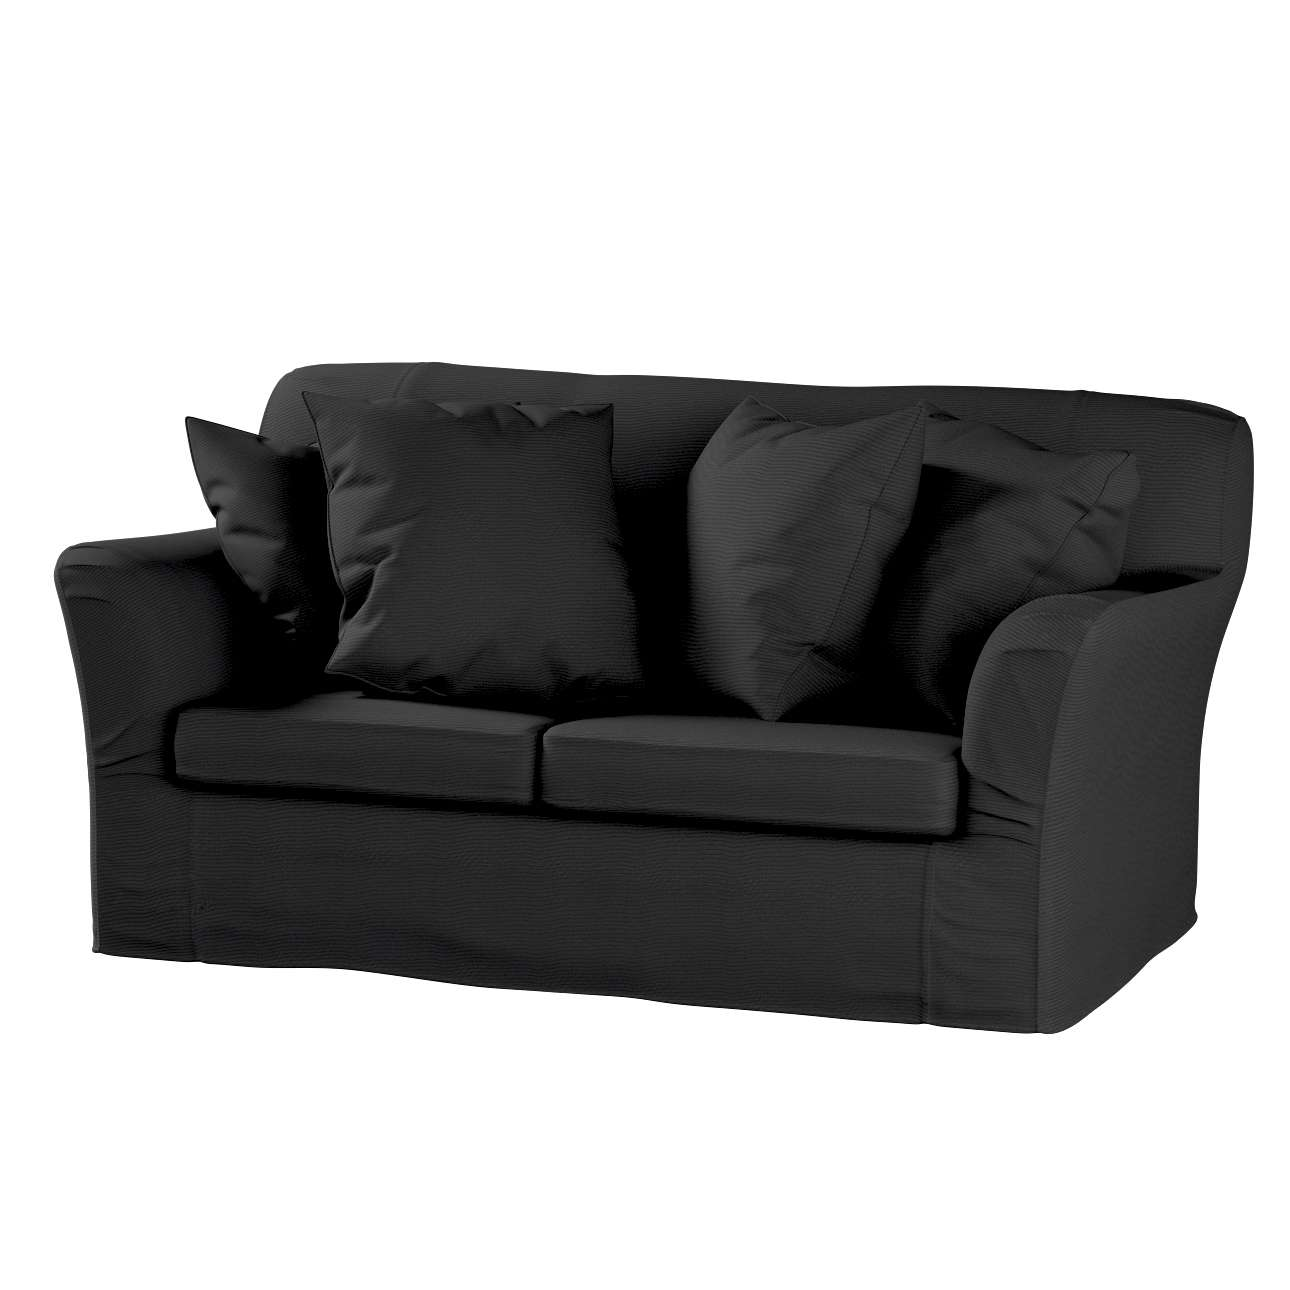 TOMELILLA  dvivietės sofos užvalkalas TOMELILLA dvivietė sofa kolekcijoje Etna , audinys: 705-00